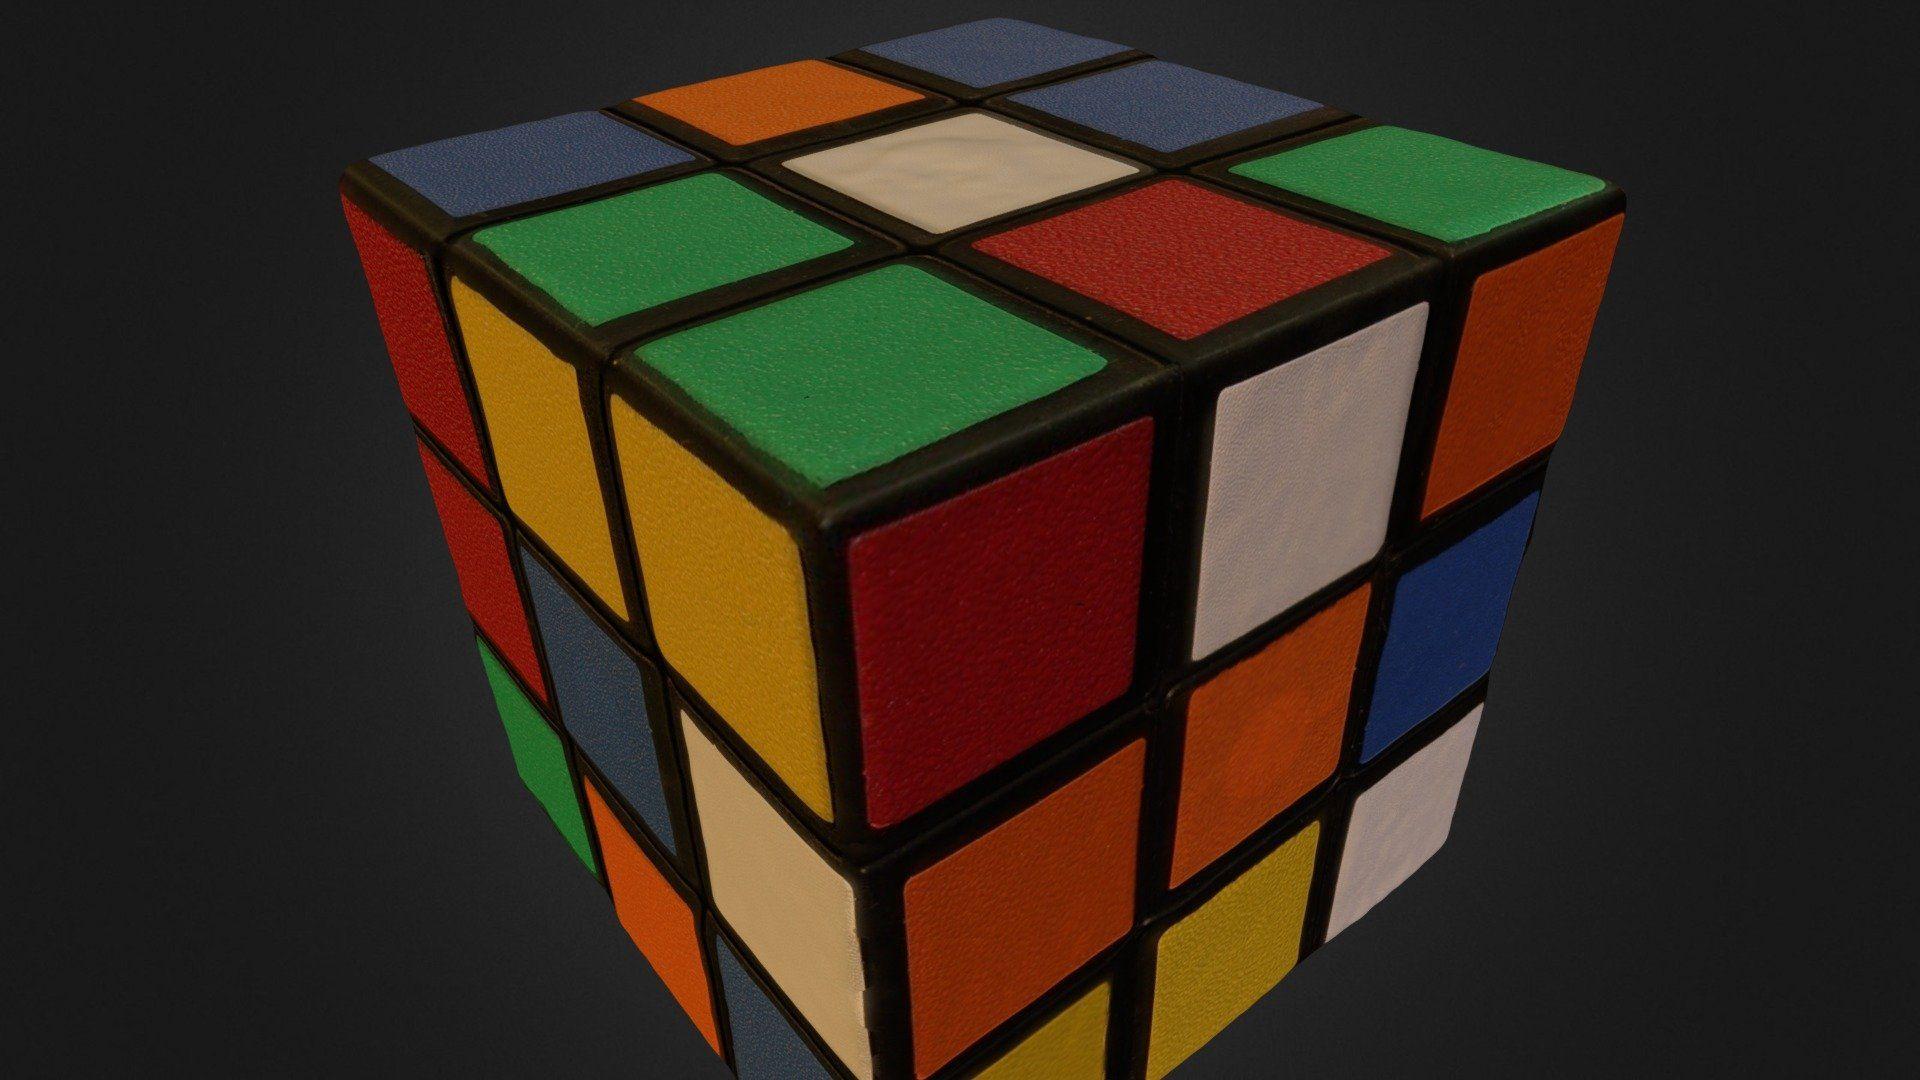 Rubiks Cube High Quality